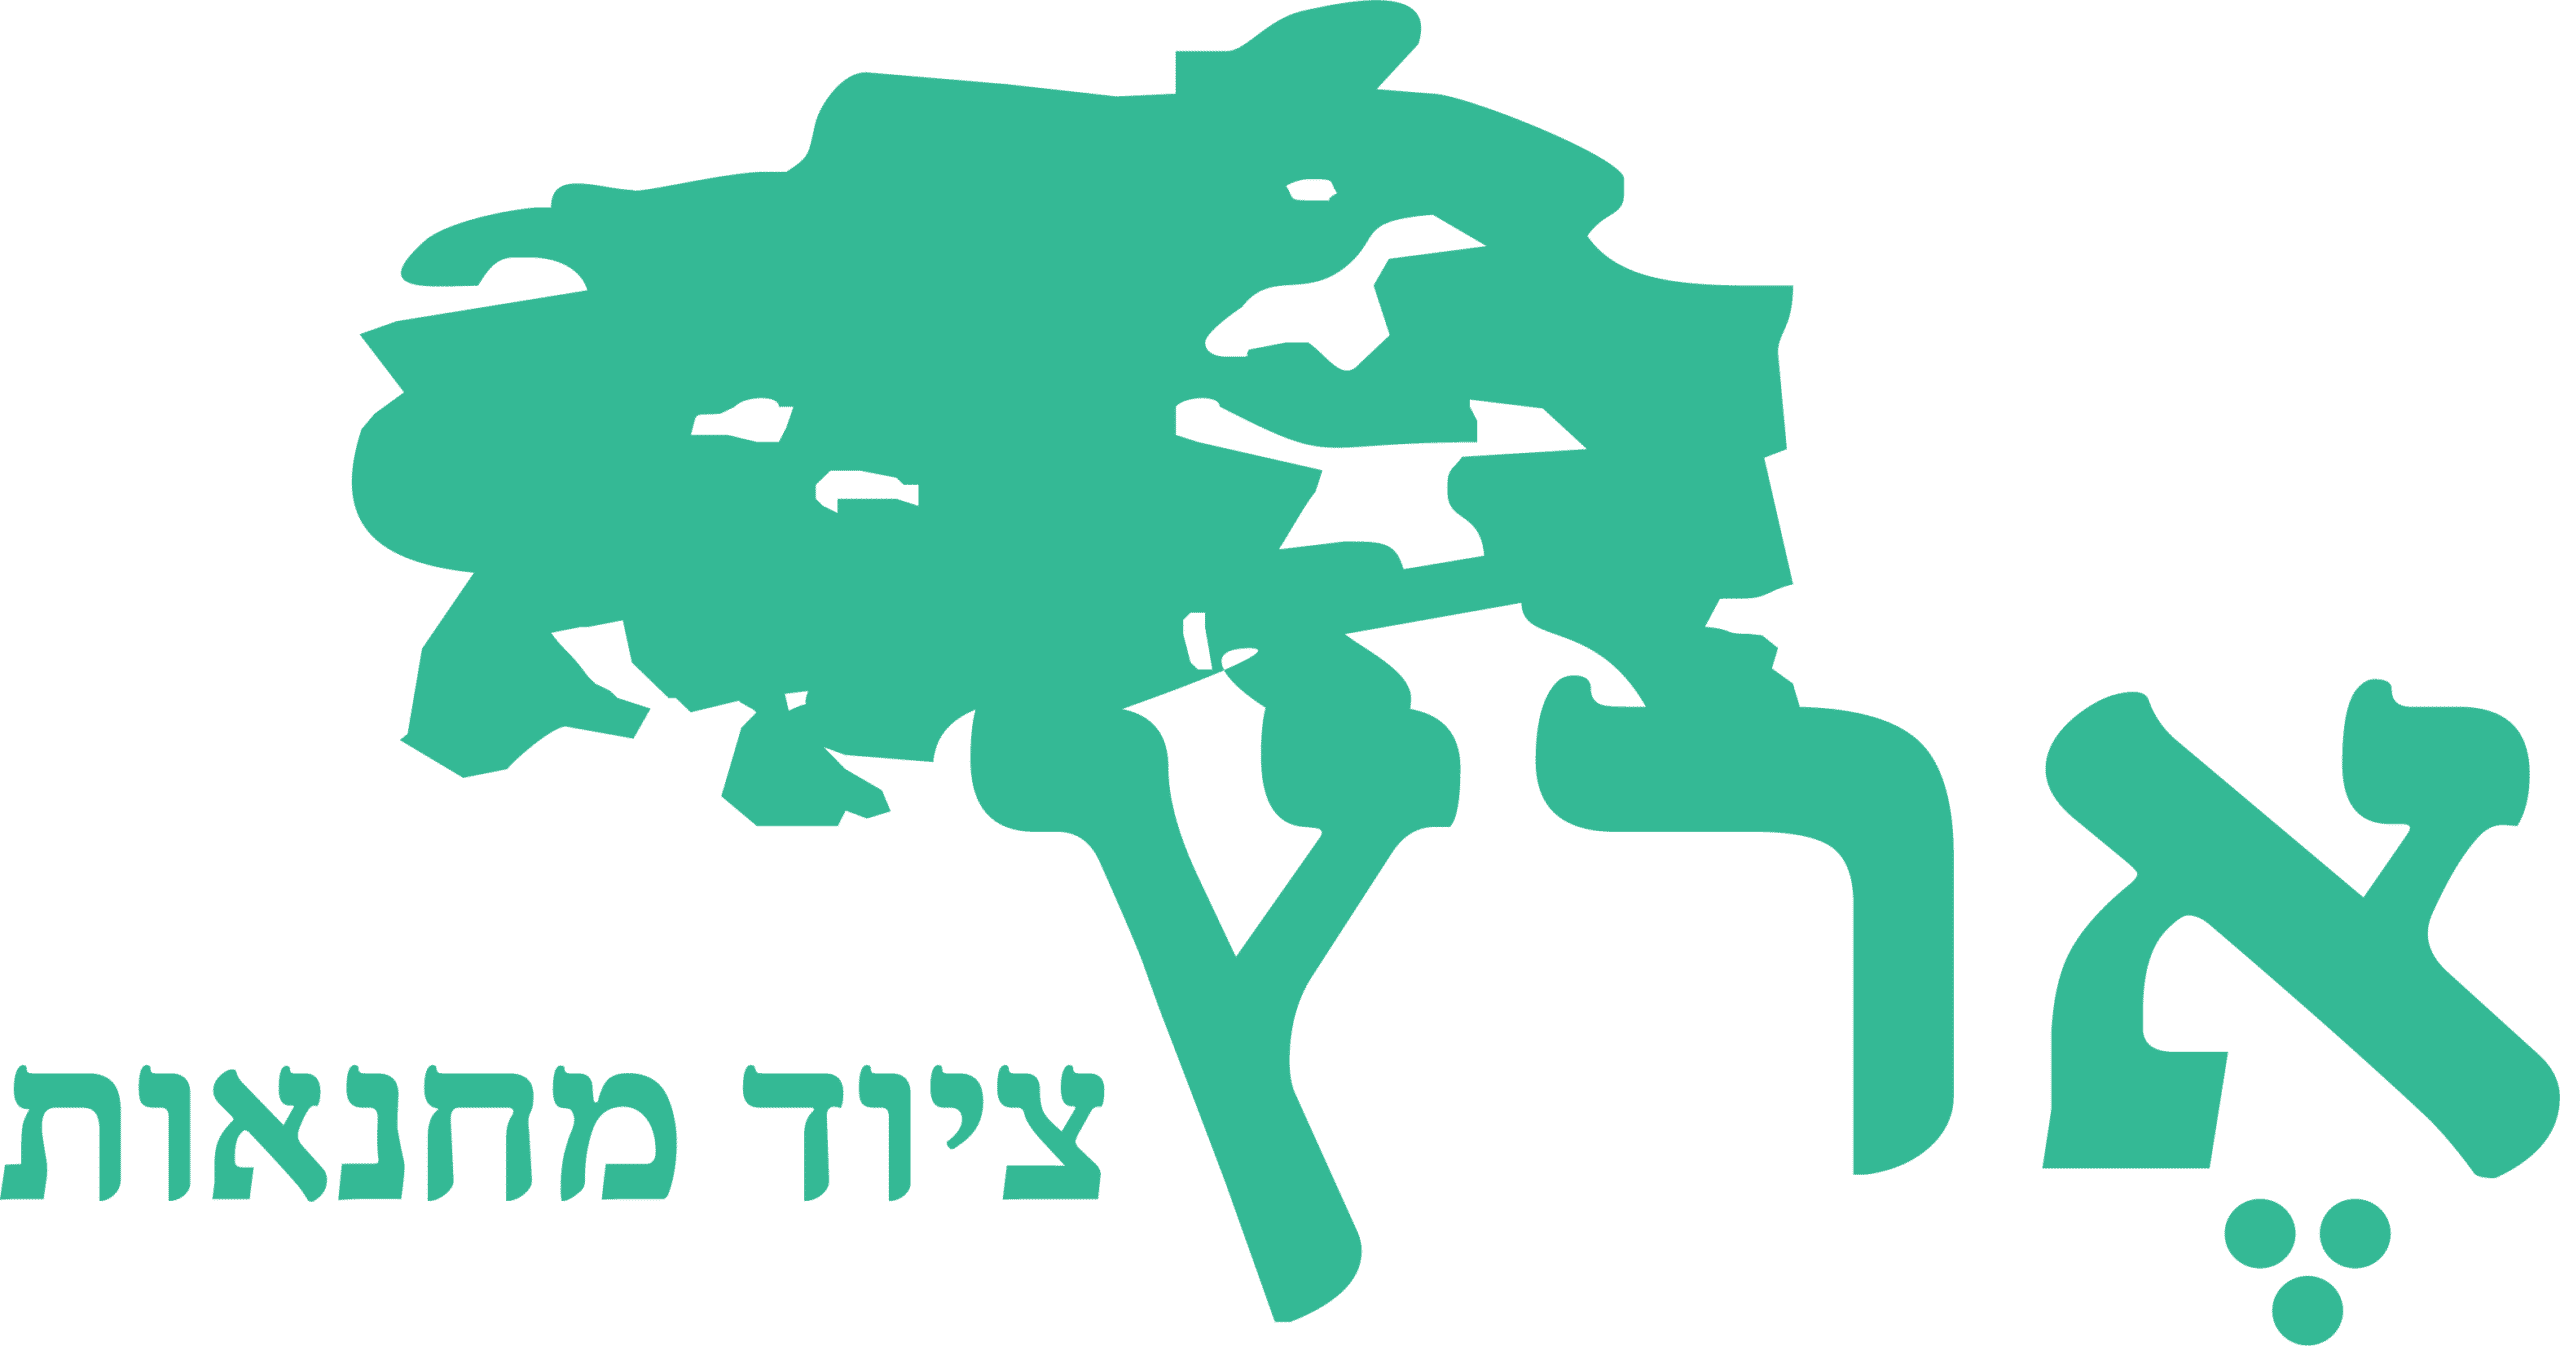 logo green ארץ ציוד מחנאות